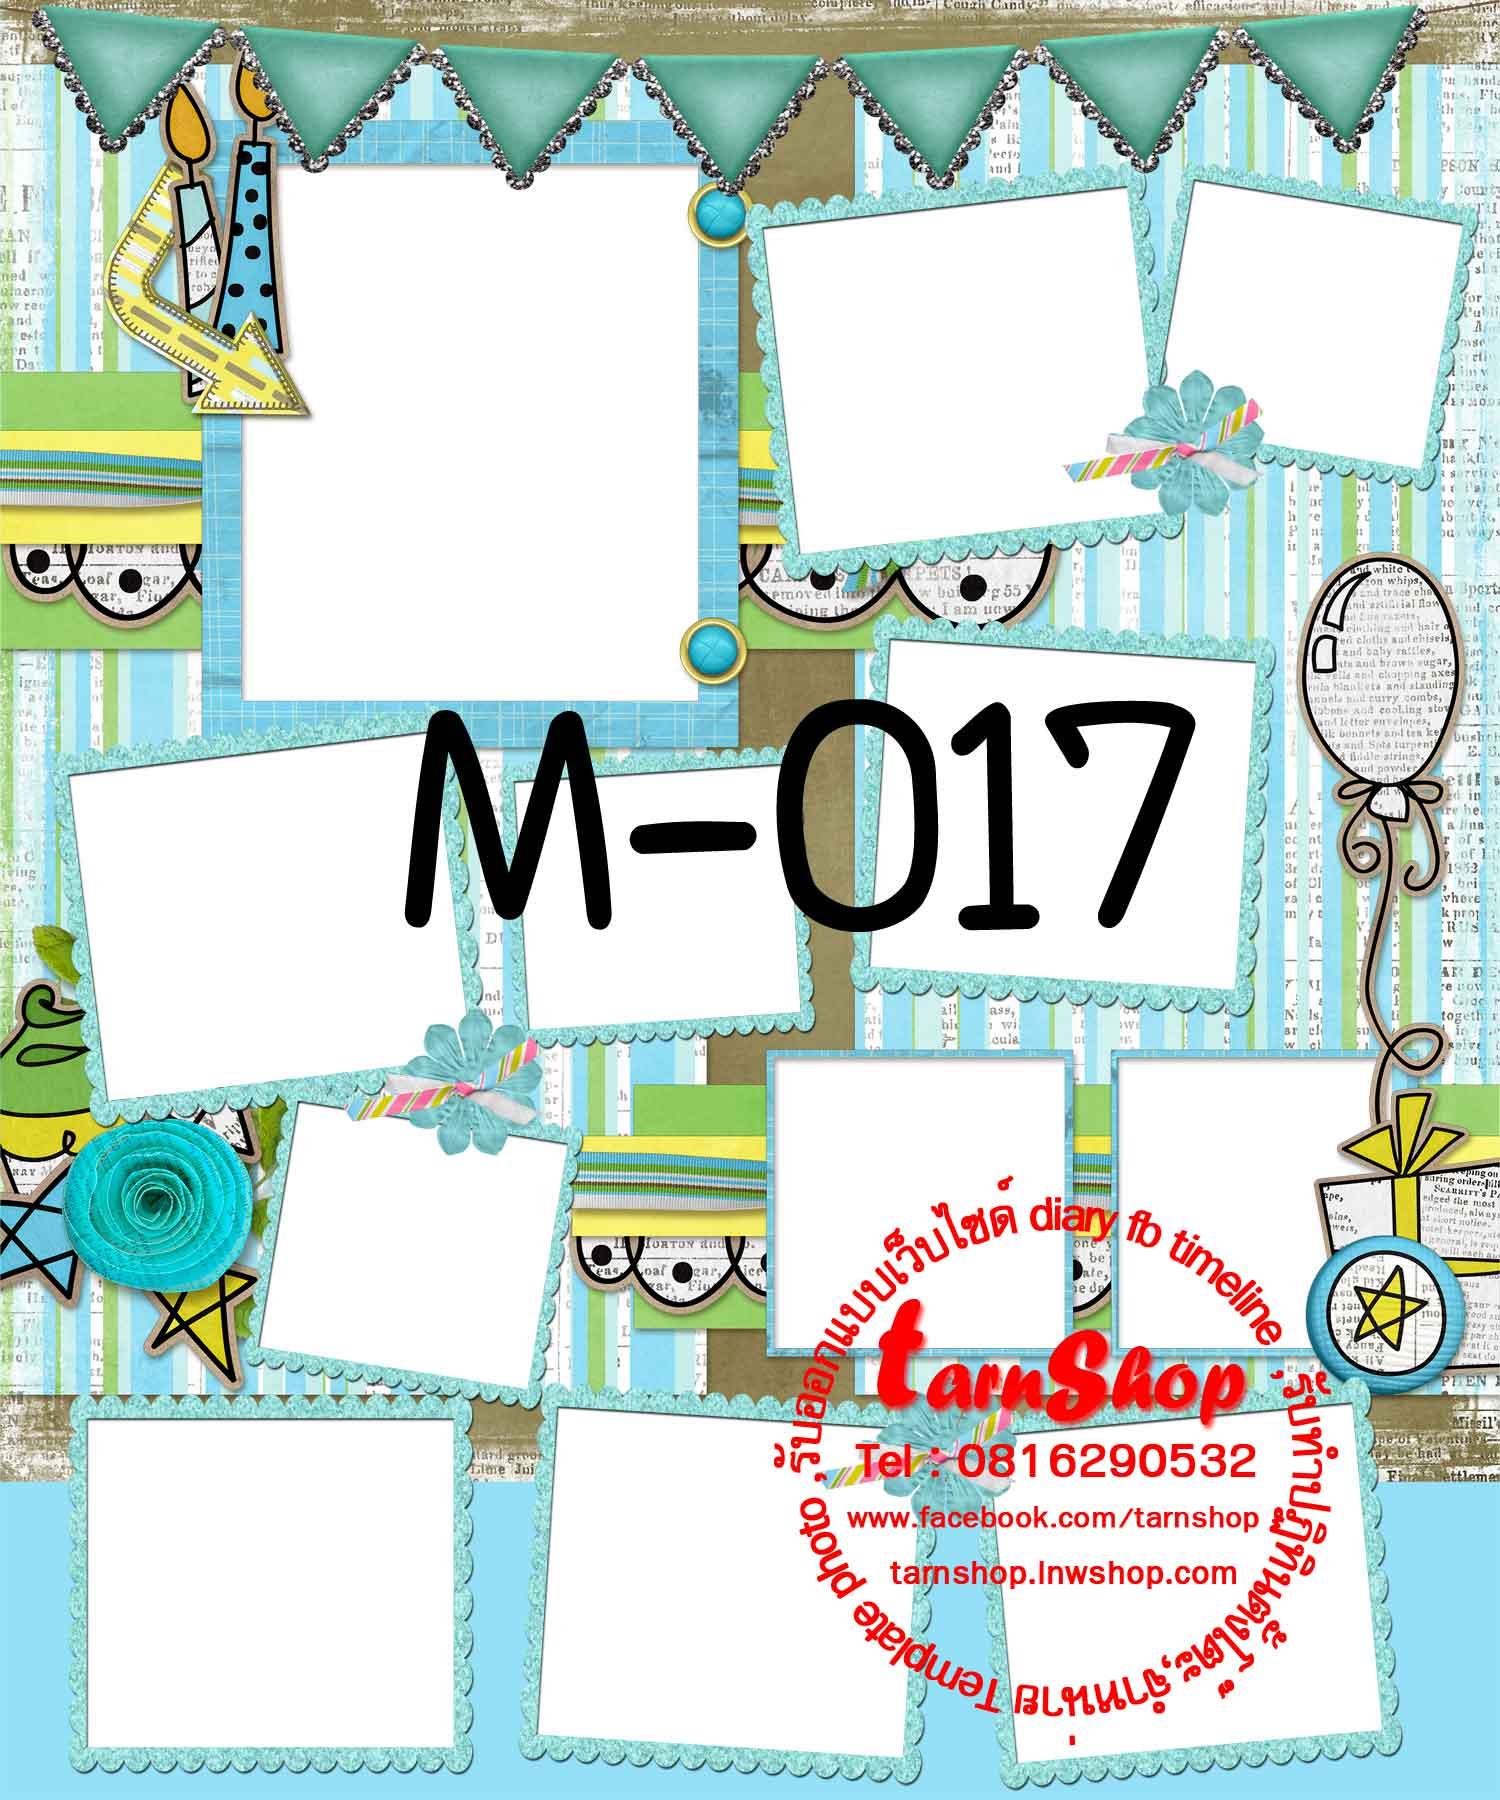 Template photo mix ขนาด 20x24 รหัส M-017